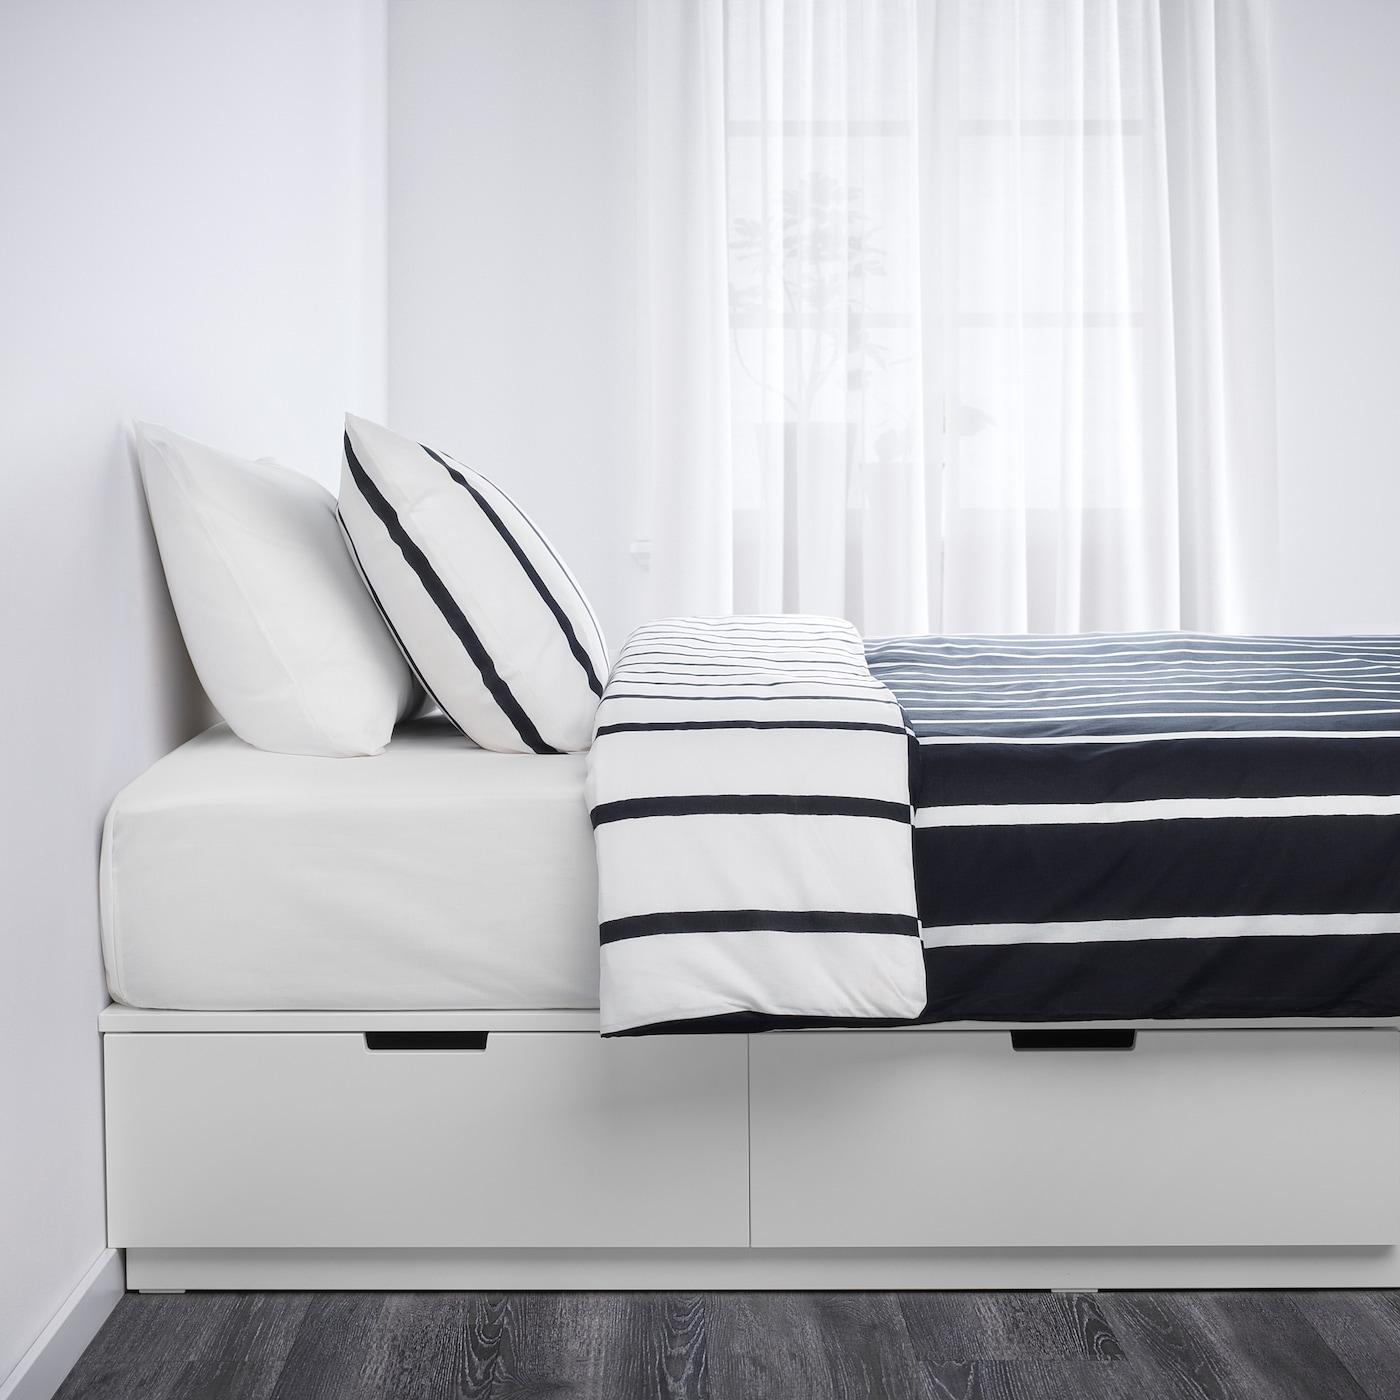 Nordli Cadre Lit Avec Rangement Blanc 160x202 Cm Ikea